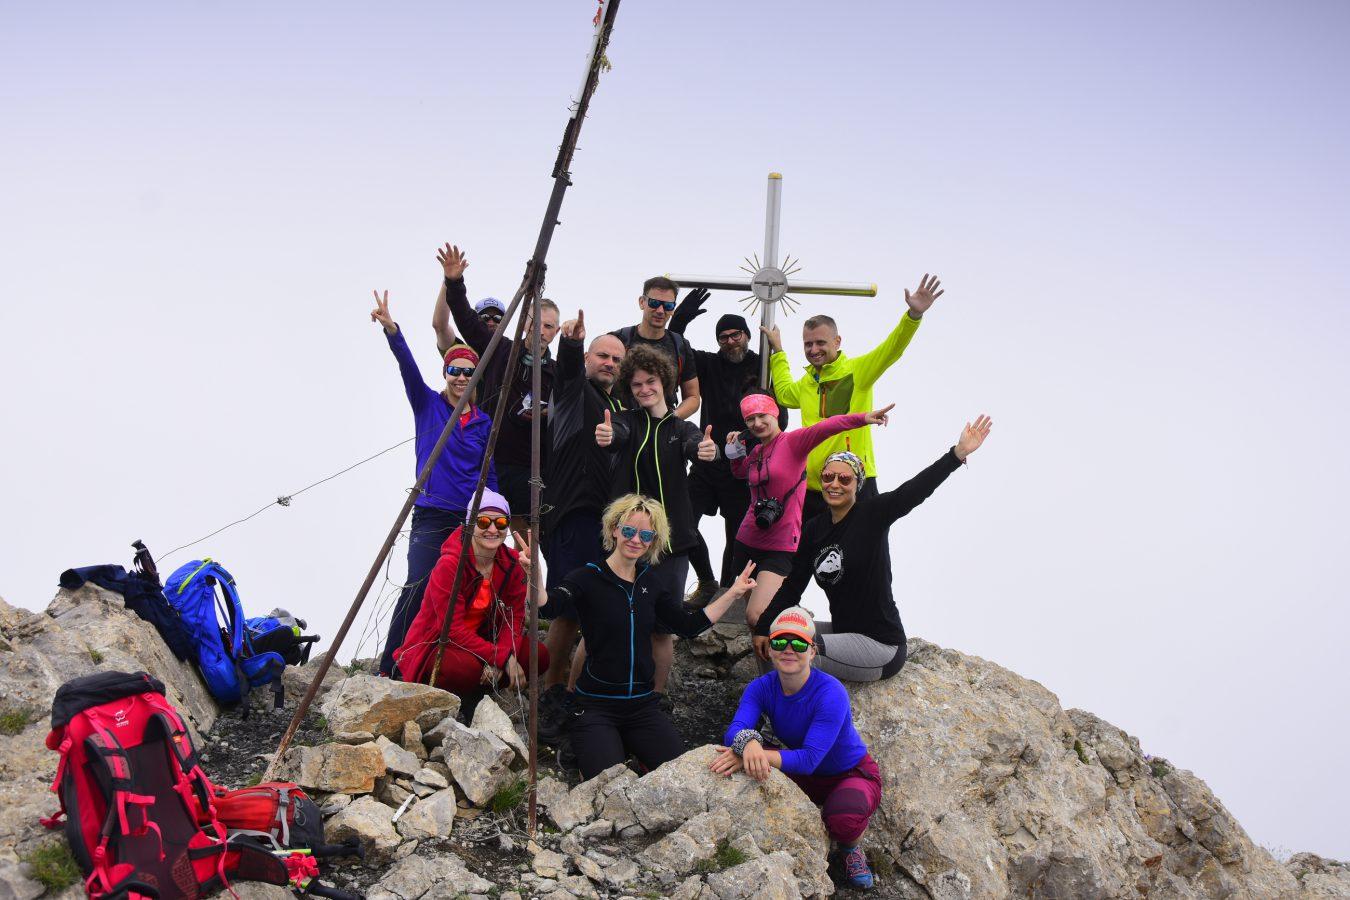 Szczyt Khustup - opis trekkingu